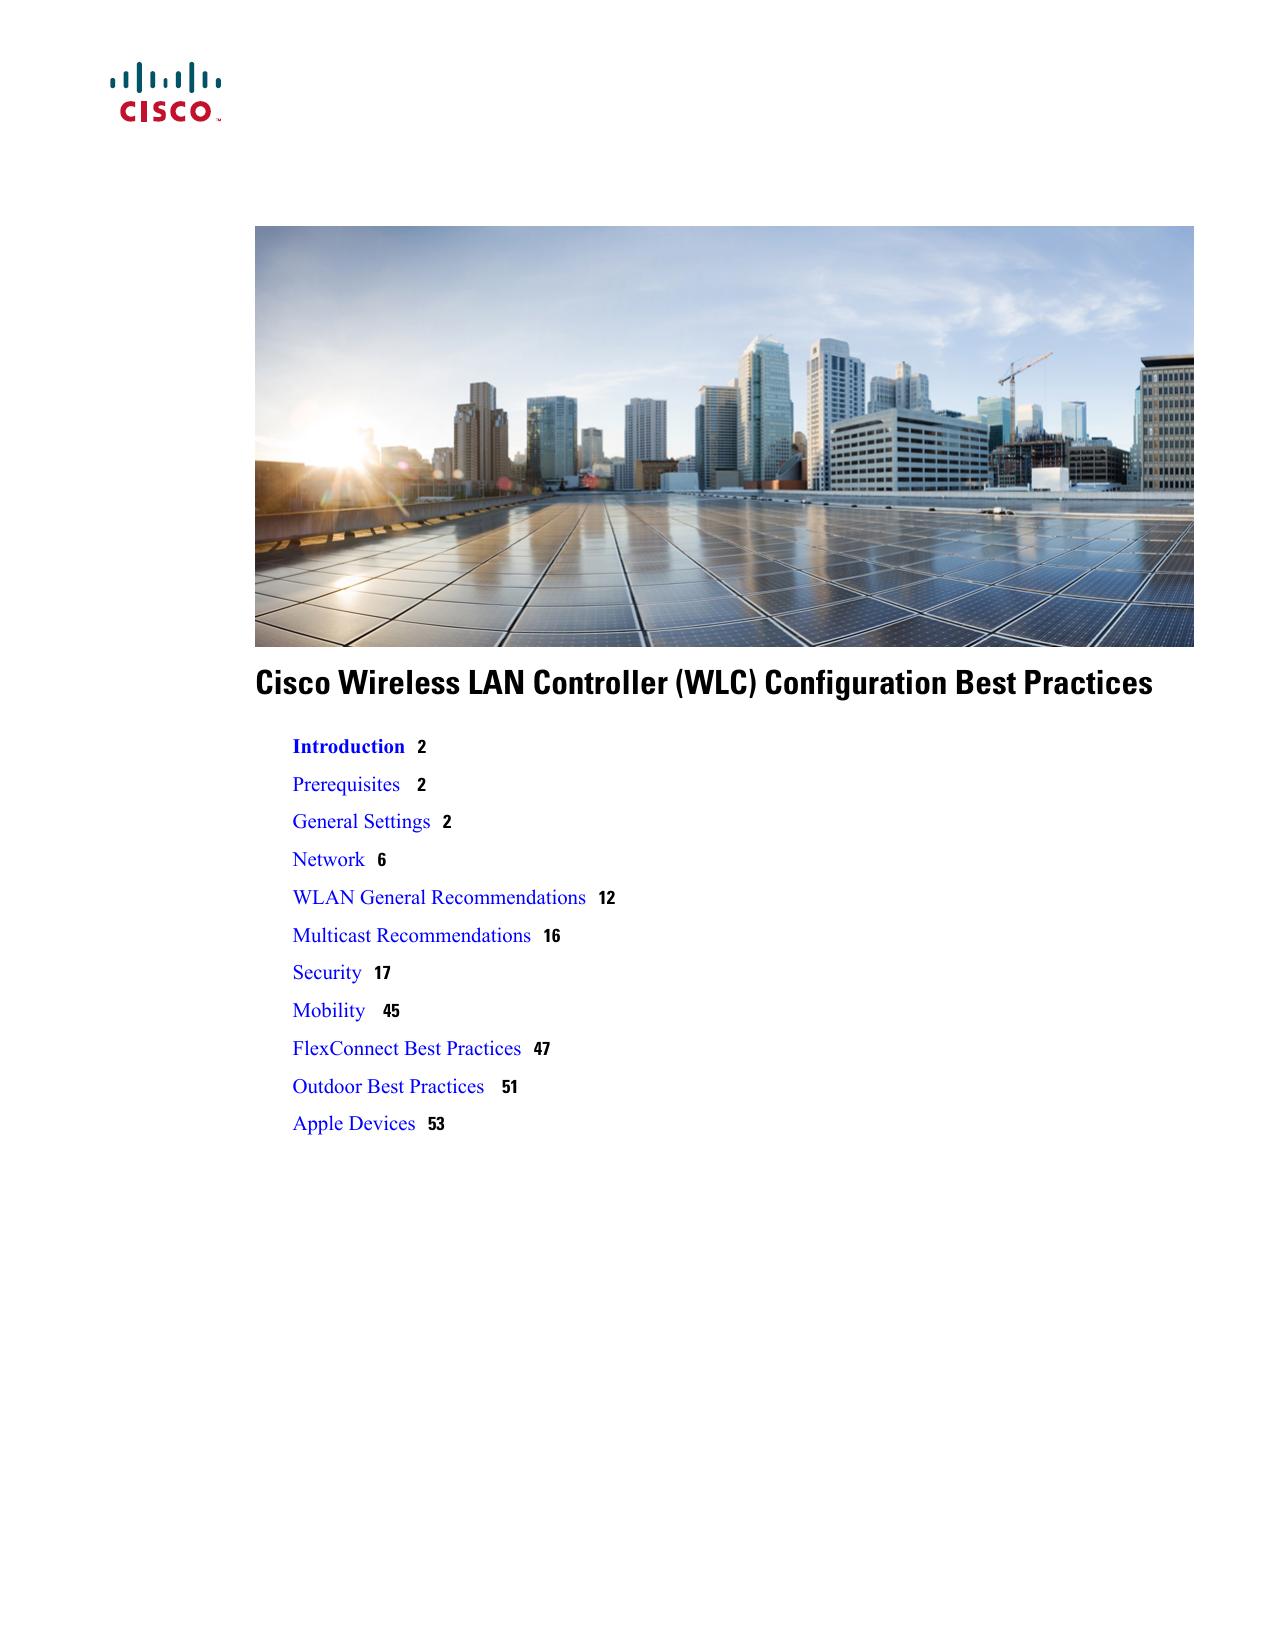 Cisco Wireless LAN Controller (WLC) Configuration Best